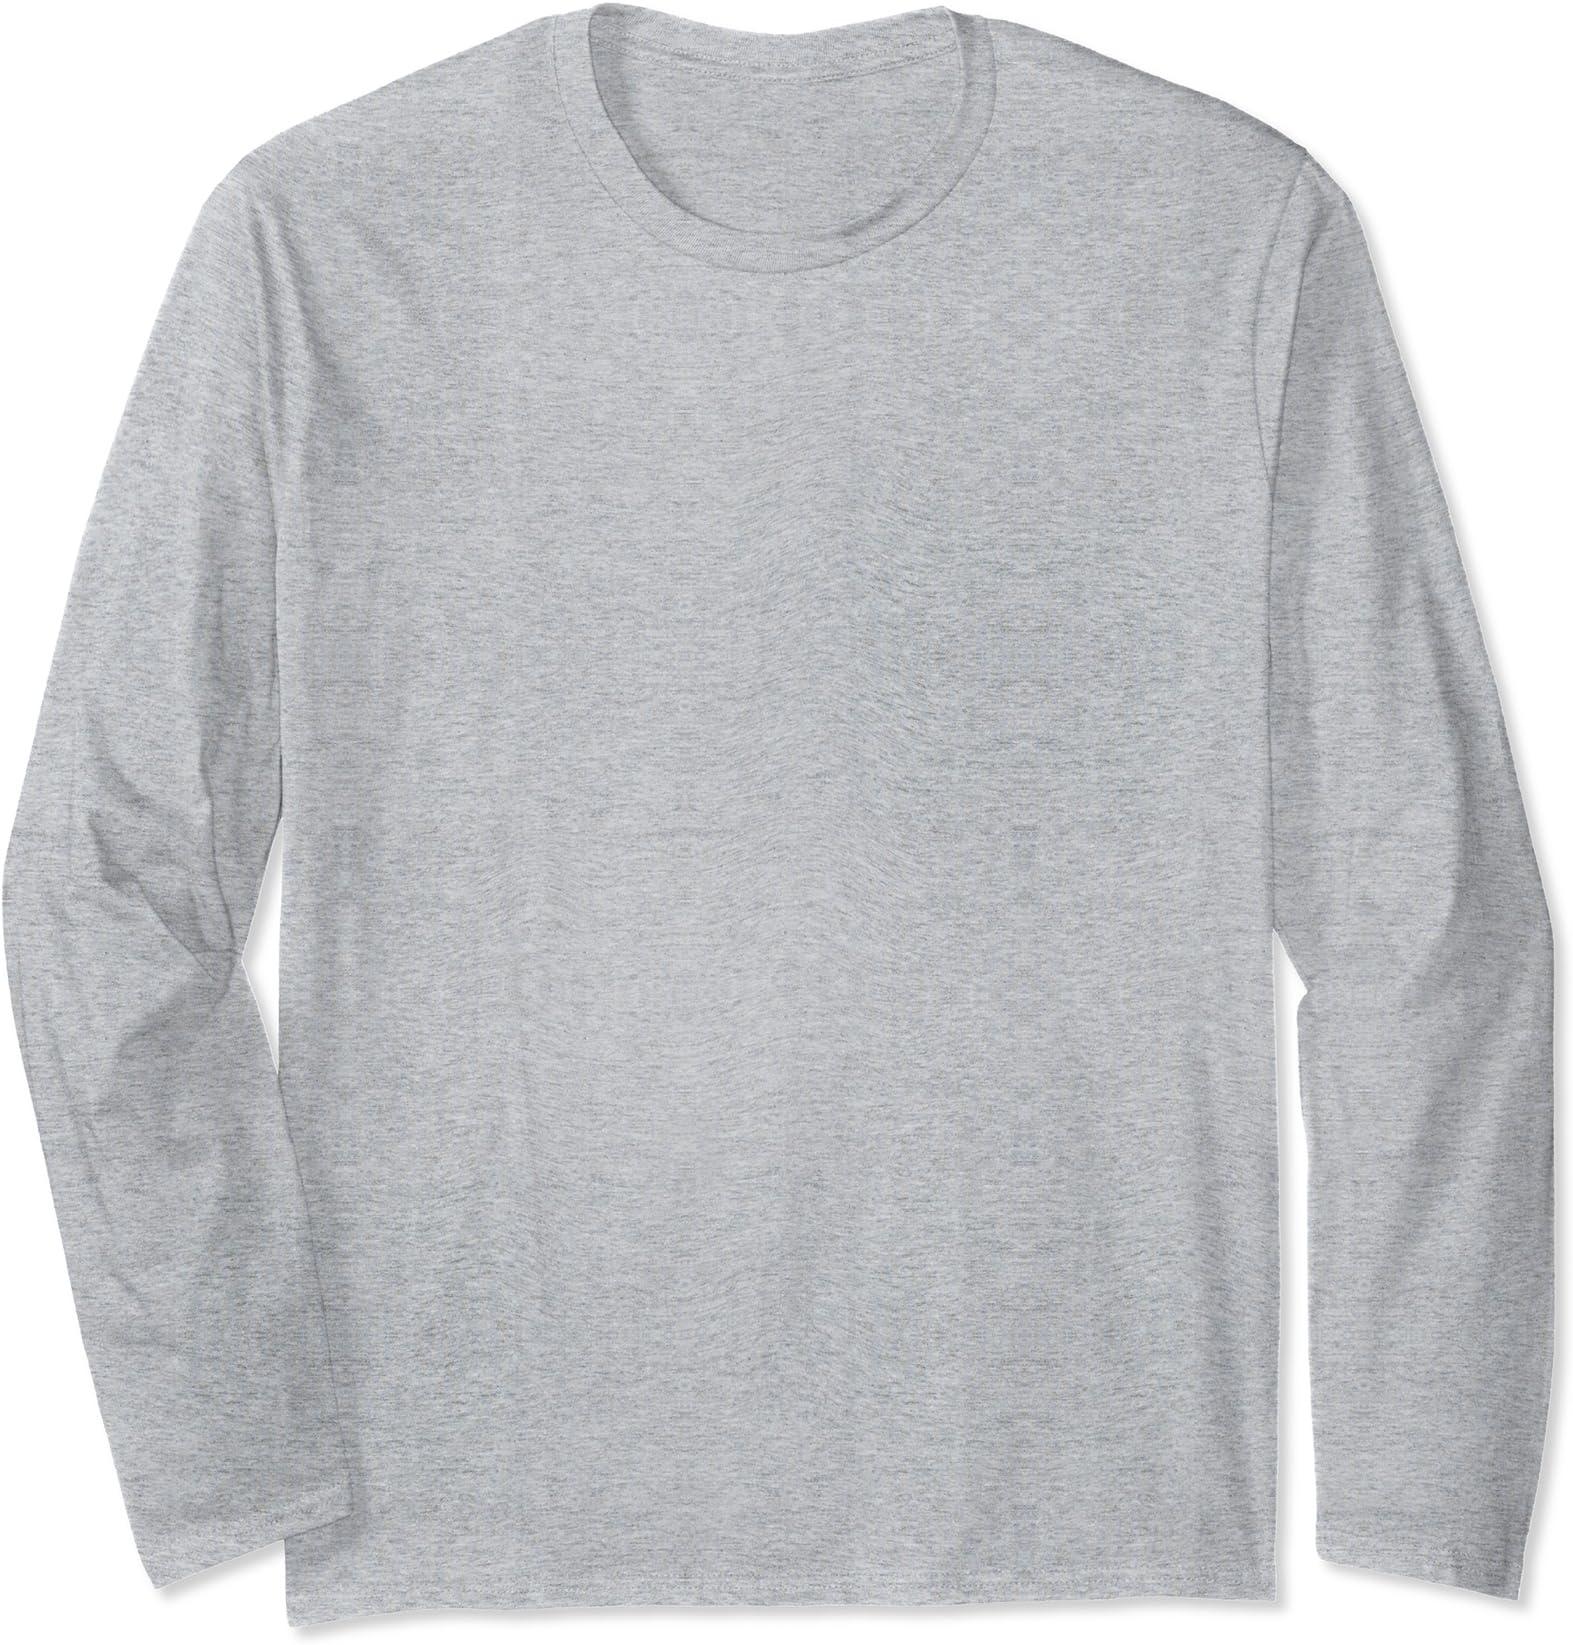 Mens Bisexual Pride Triangles in Pride Flag Long Sleeve Crewneck Sweatshirt Cotton Pullover